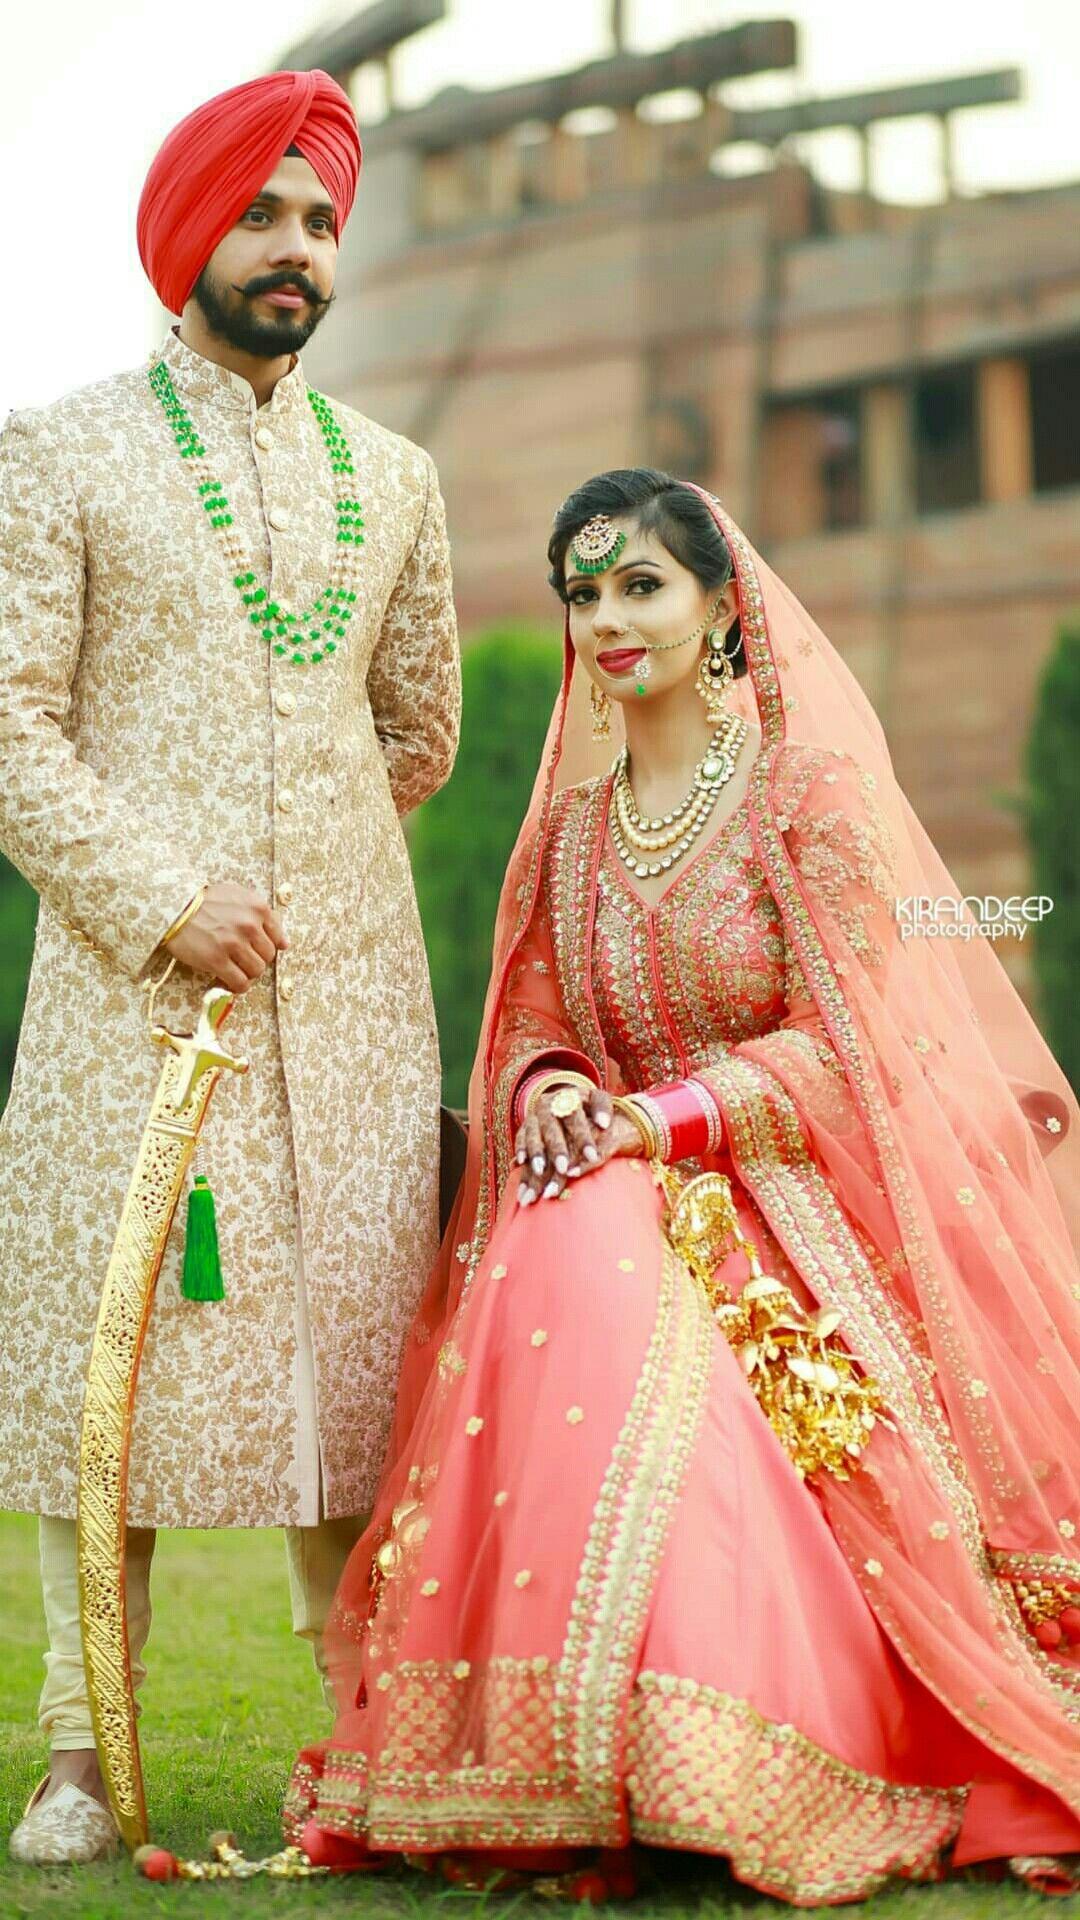 Follow Me Maliha Tabassum For More Indian Wedding Couple Groom